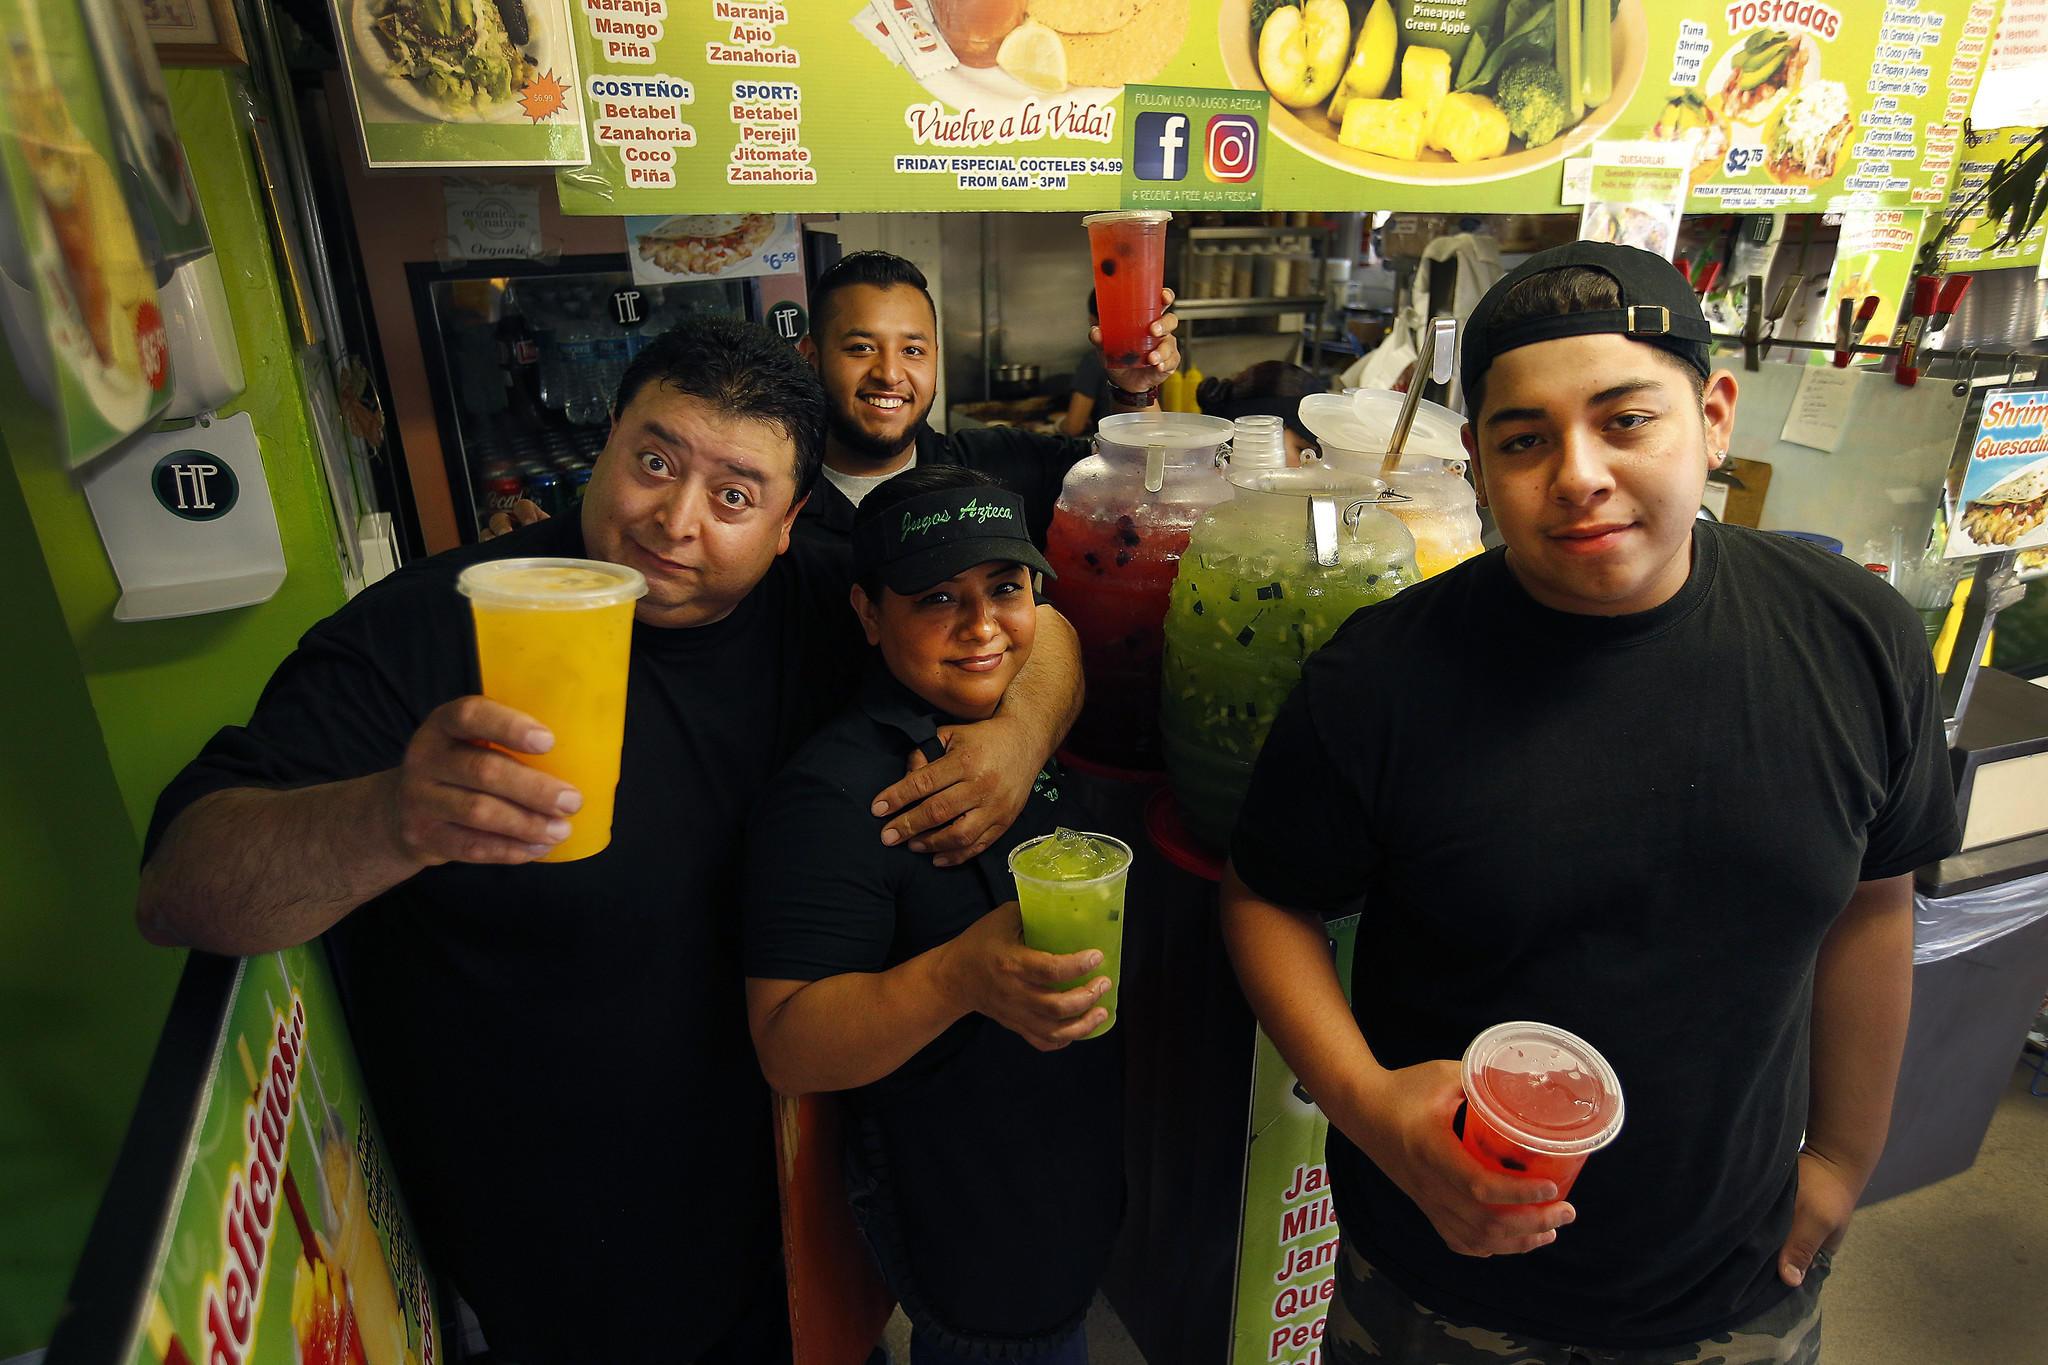 From left, Efrain Peña, son Raul Peña, wife Veronica Rodriguez, and son Randy Peña.